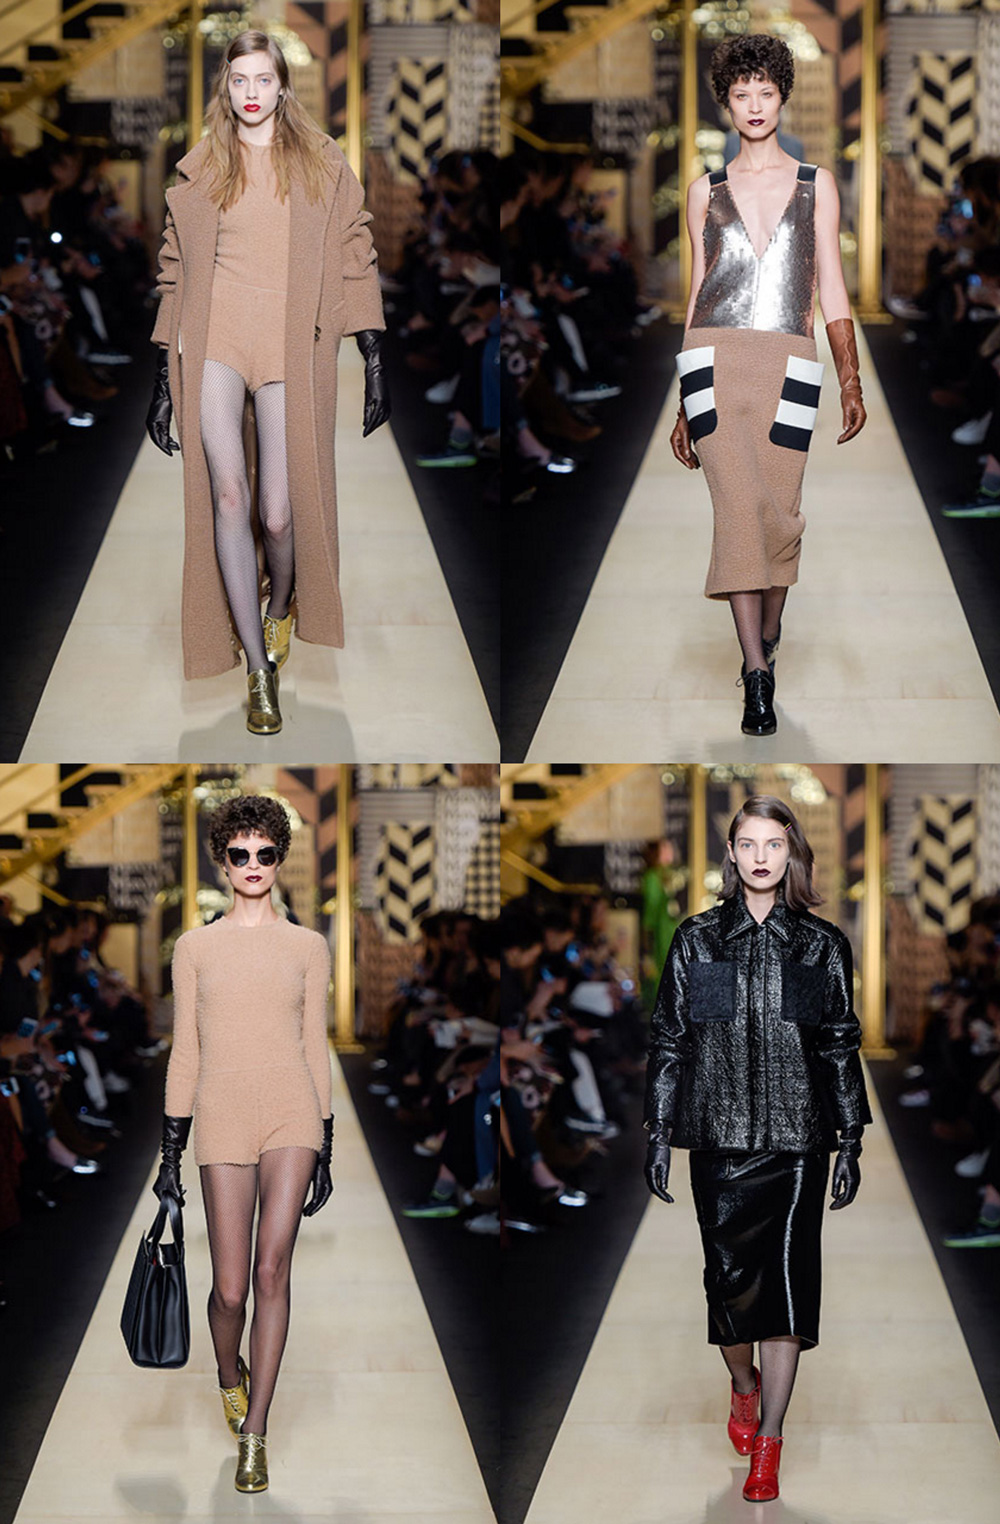 fashion-week-highlights-25